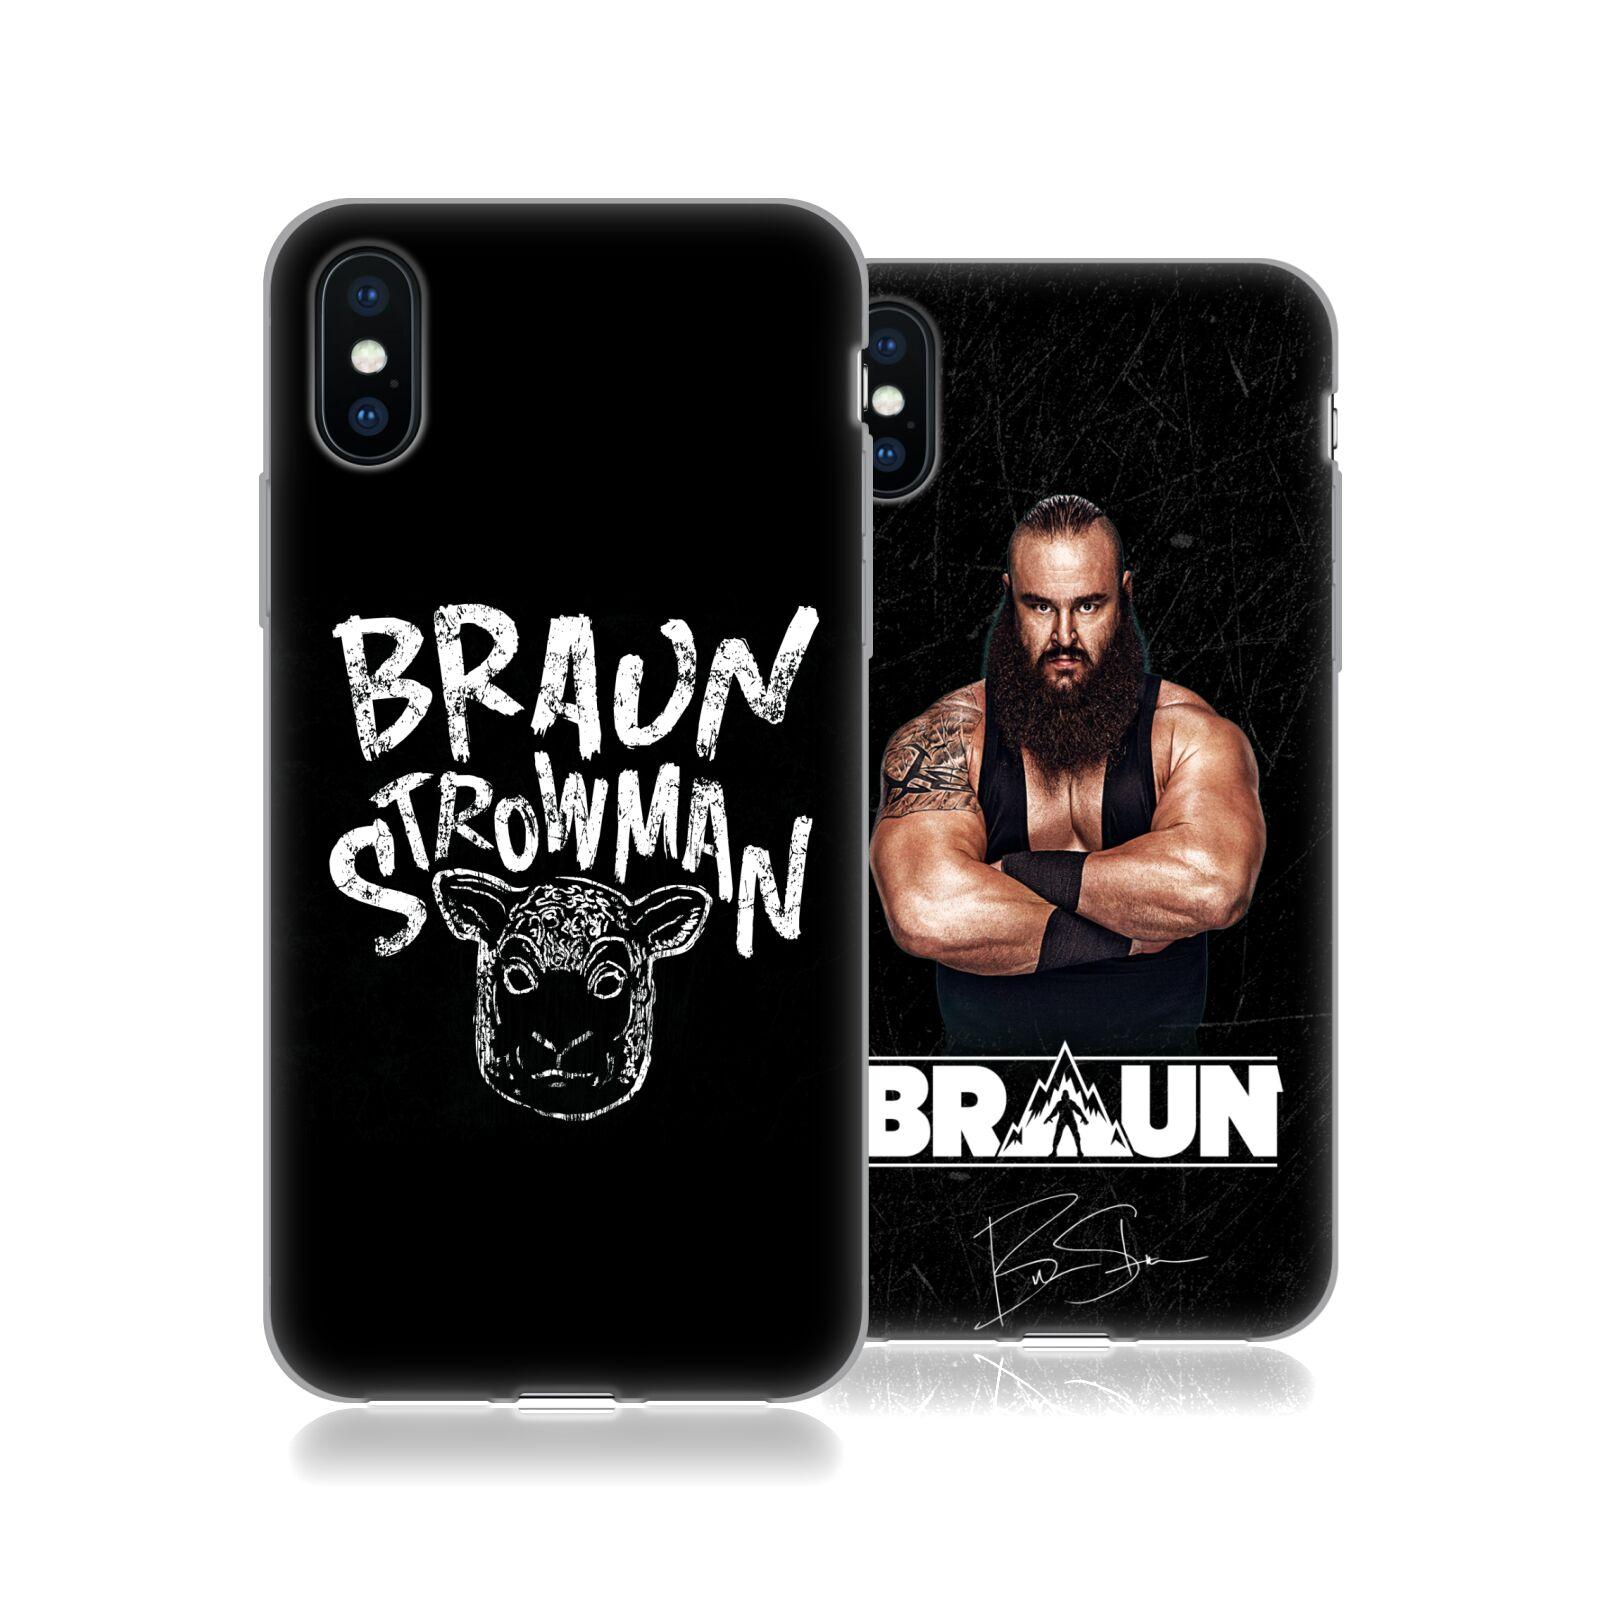 WWE <!--translate-lineup-->Braun Strowman<!--translate-lineup-->